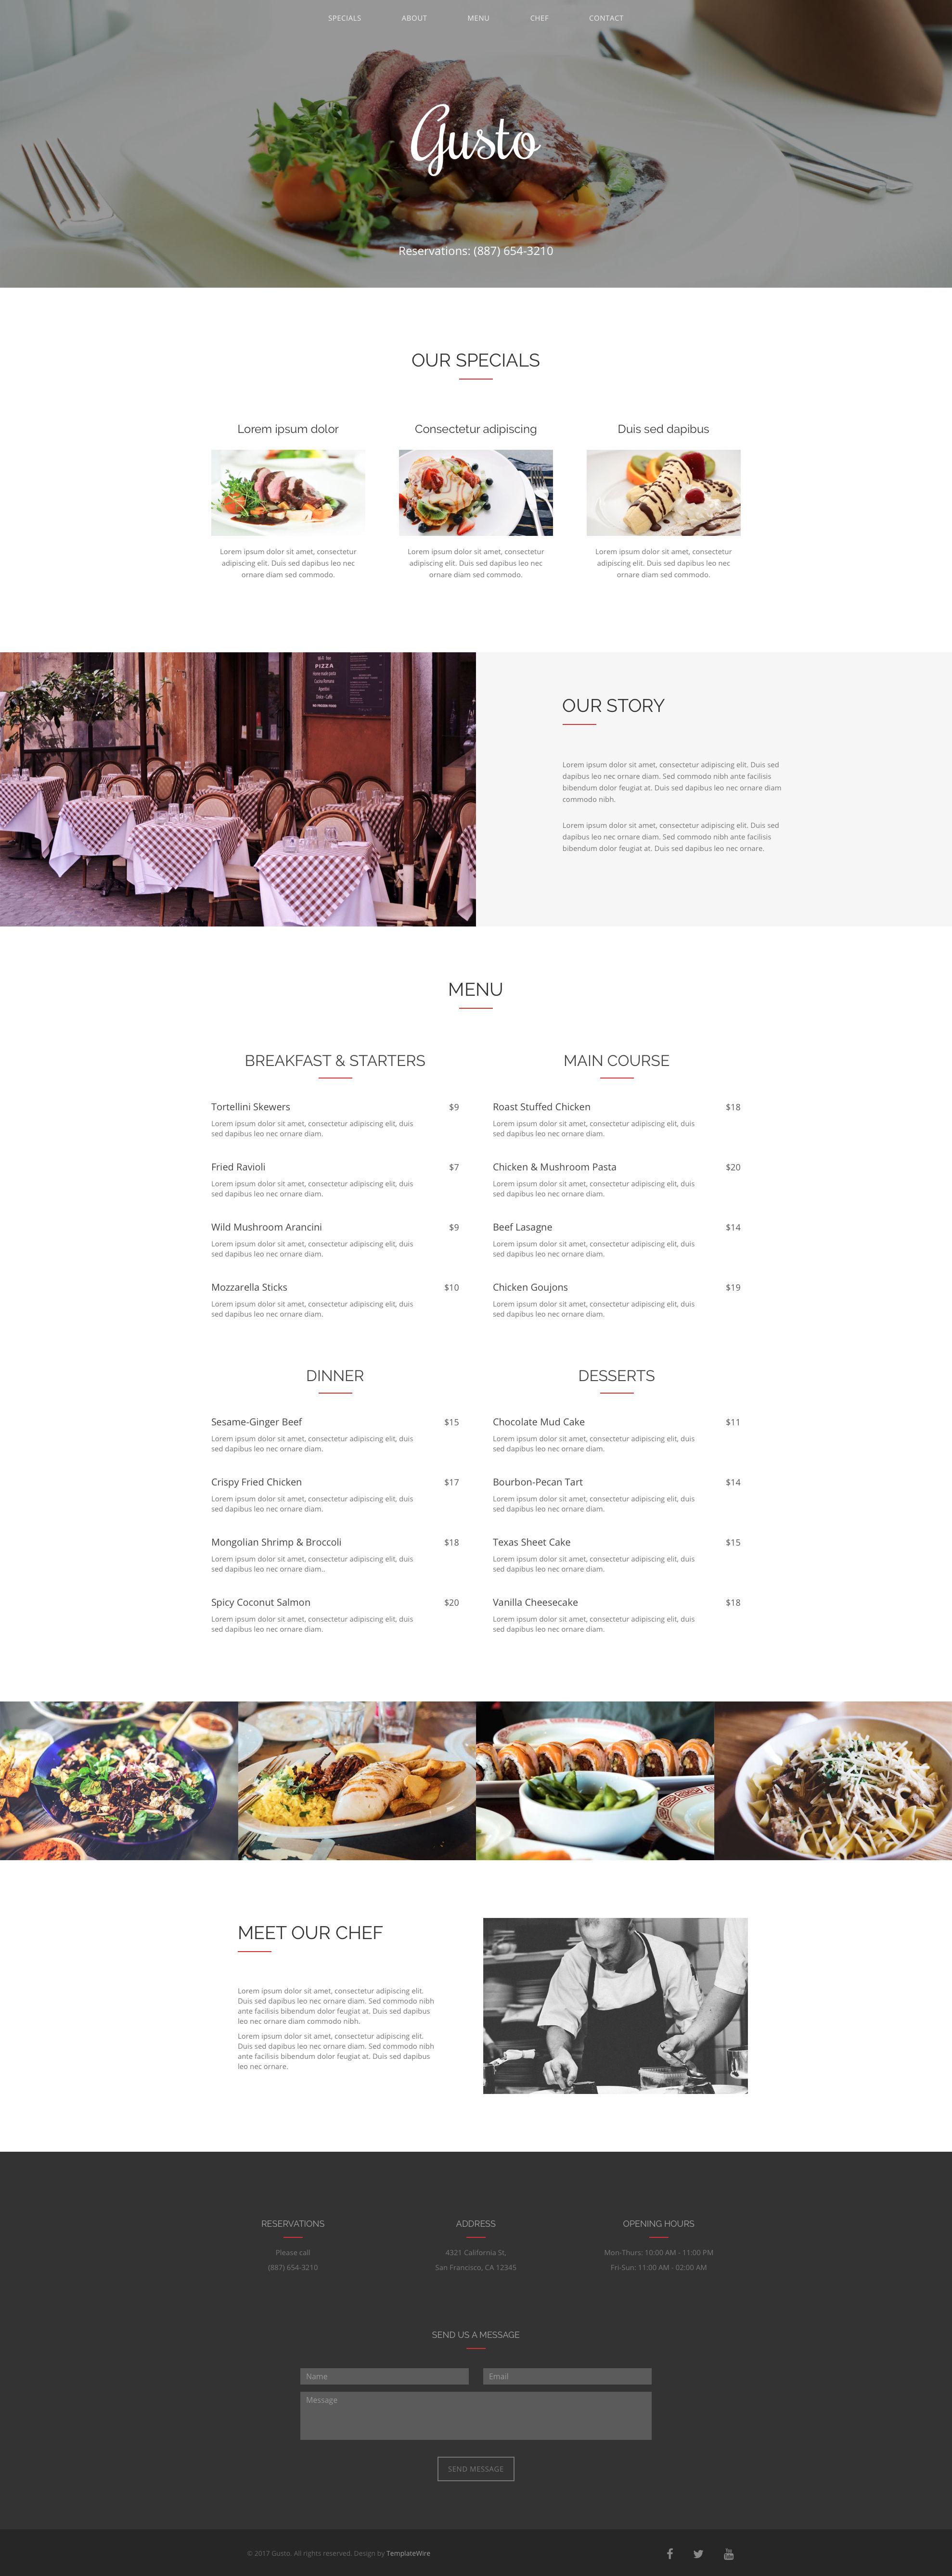 Gusto Free Responsive Html5 Bootstrap Restaurant Template